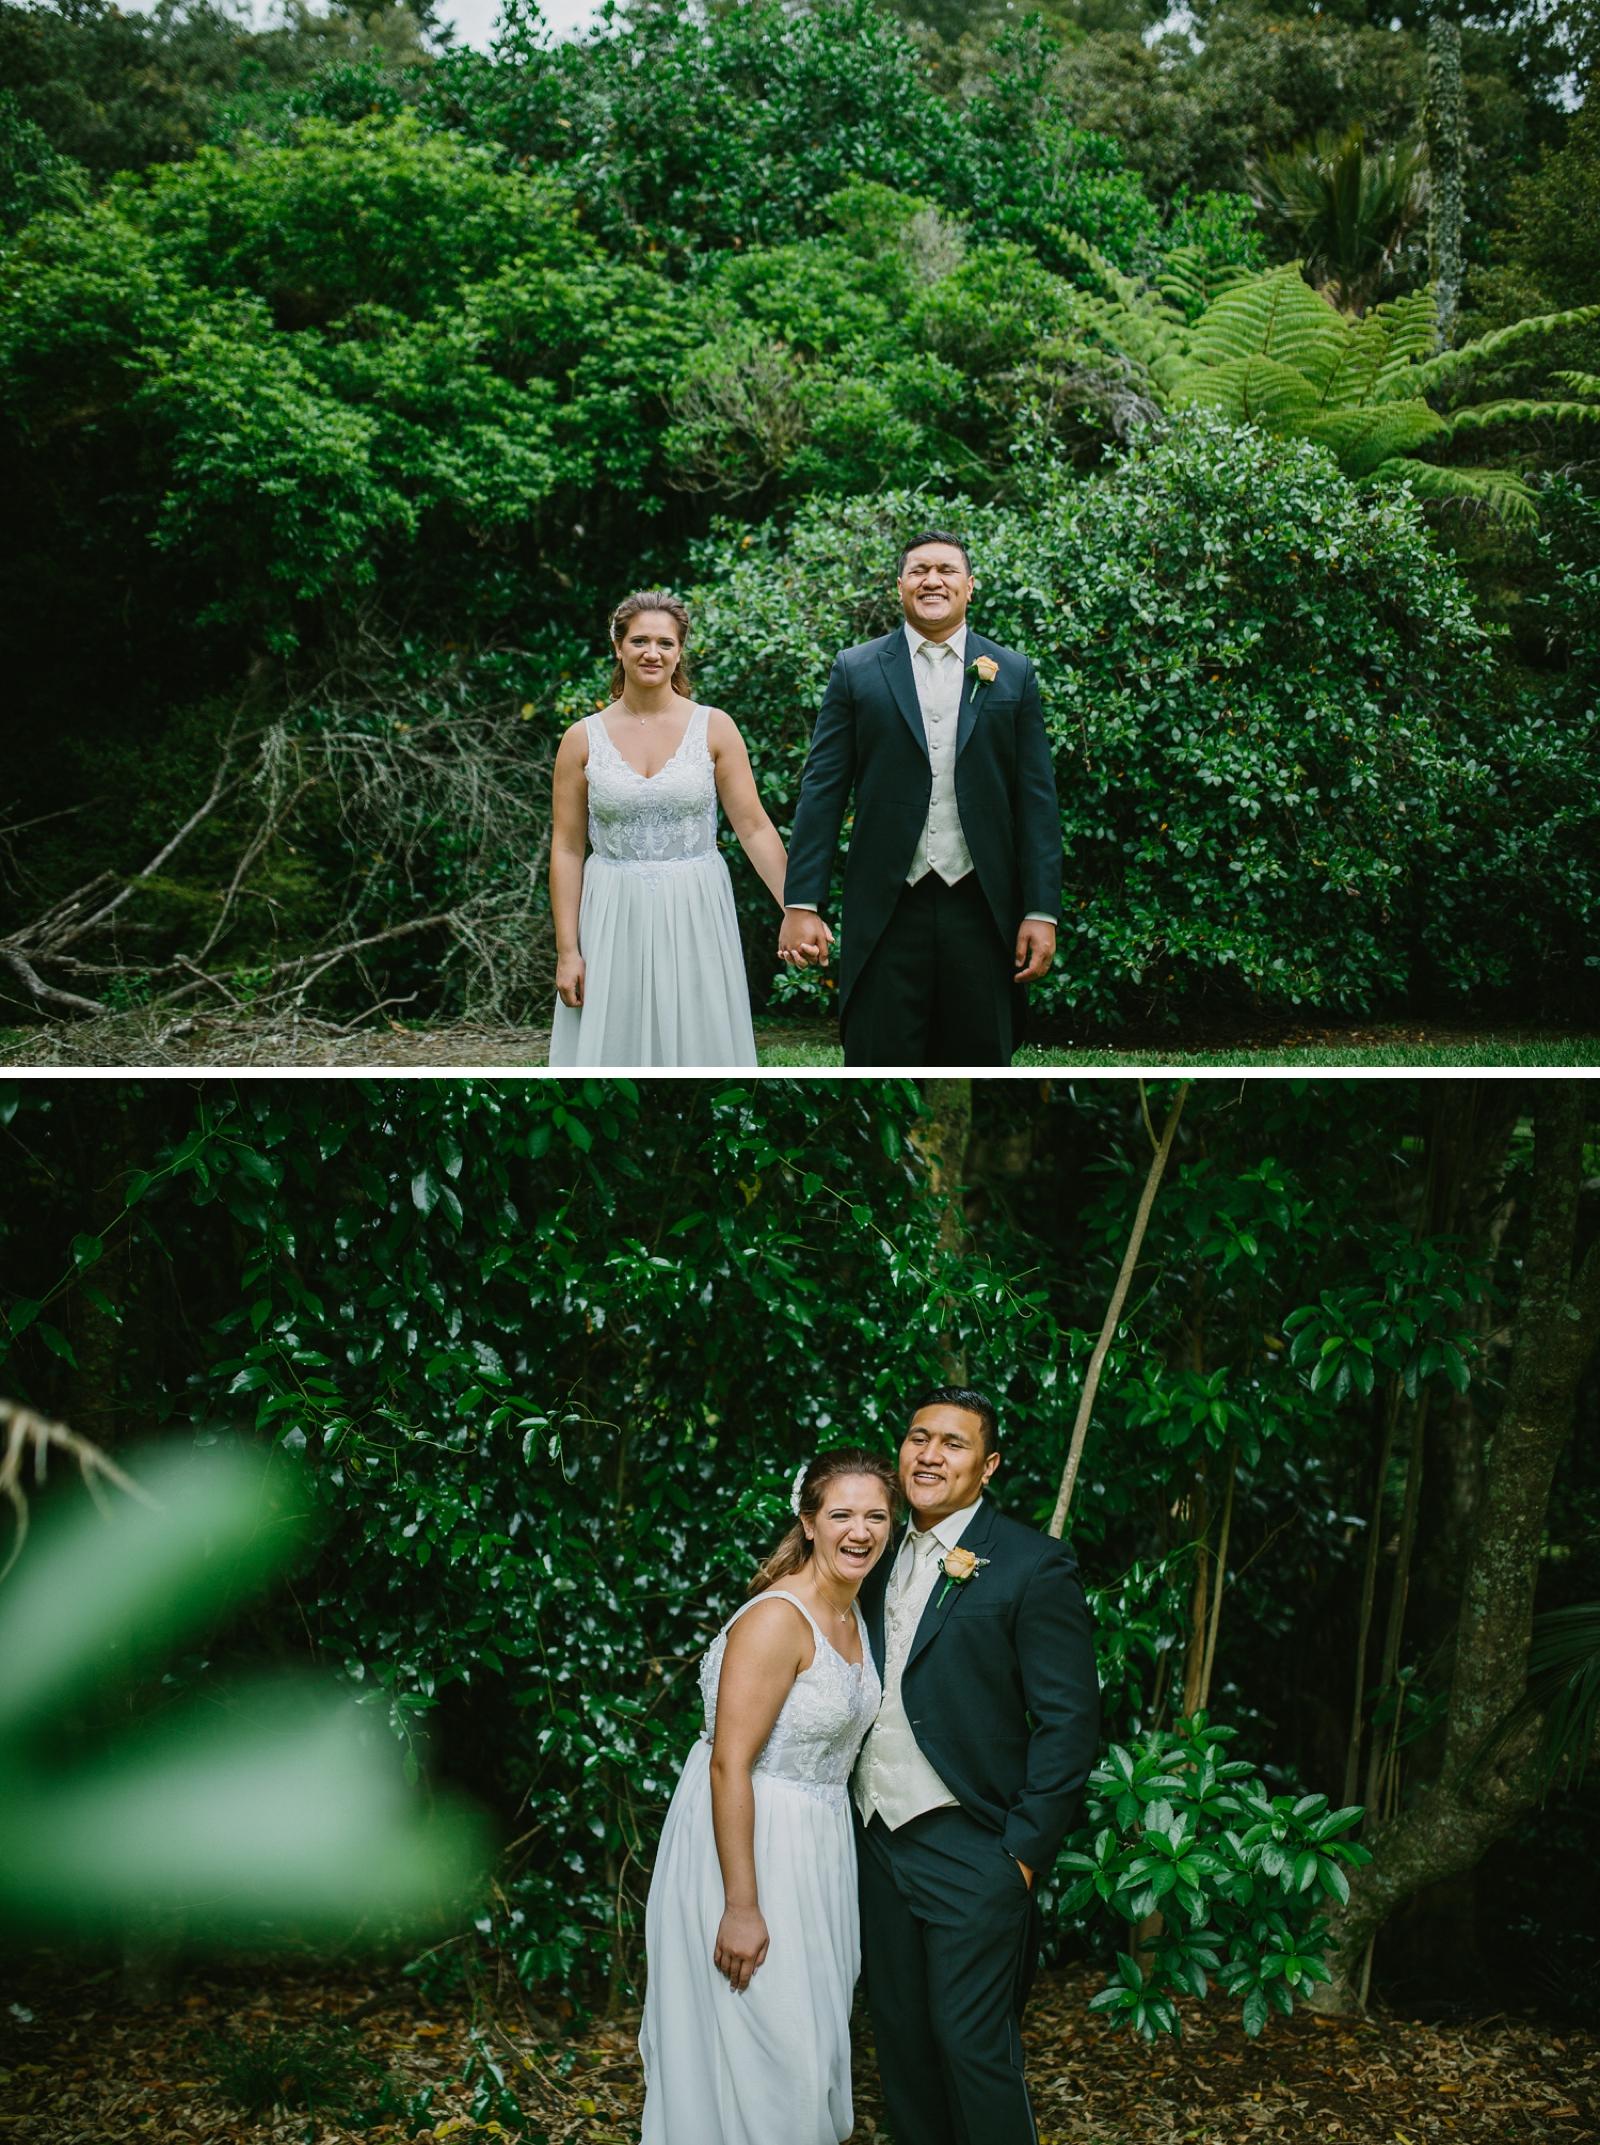 GabbyFiti_Auckland Wedding Photographer_Patty Lagera_0069.jpg